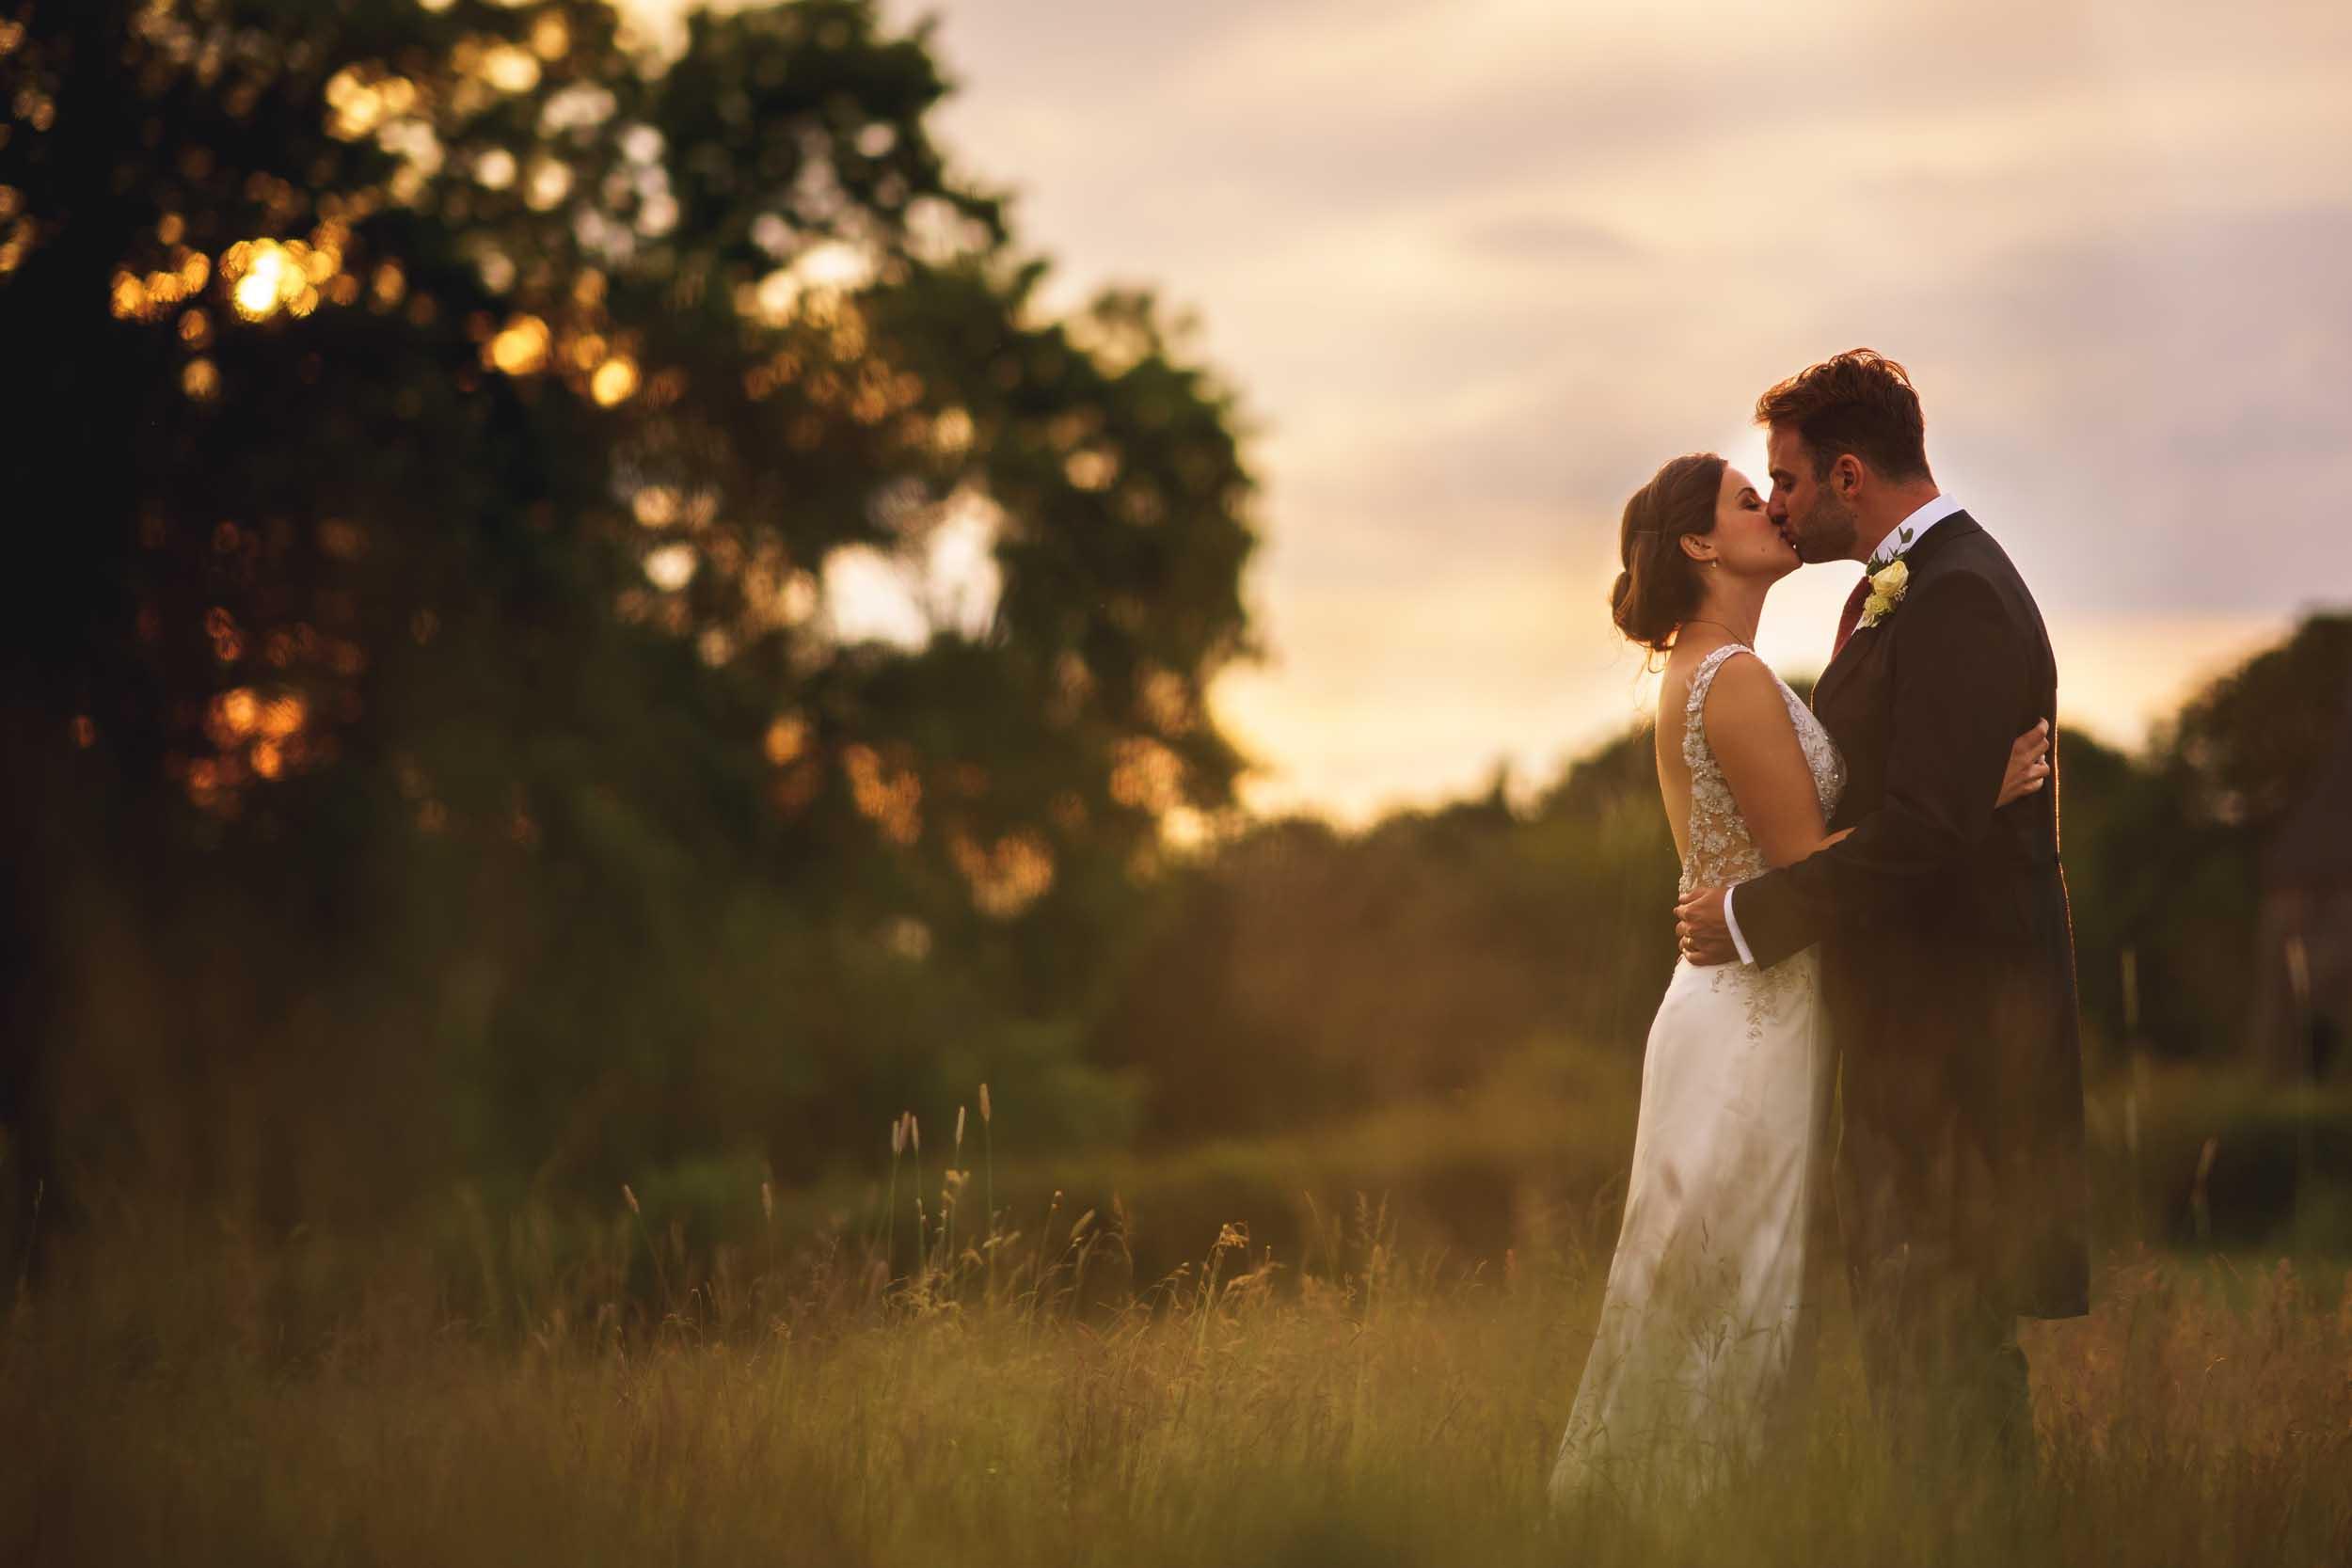 Wedding Photographers in Herefordshire, Herefordshire Wedding Photography